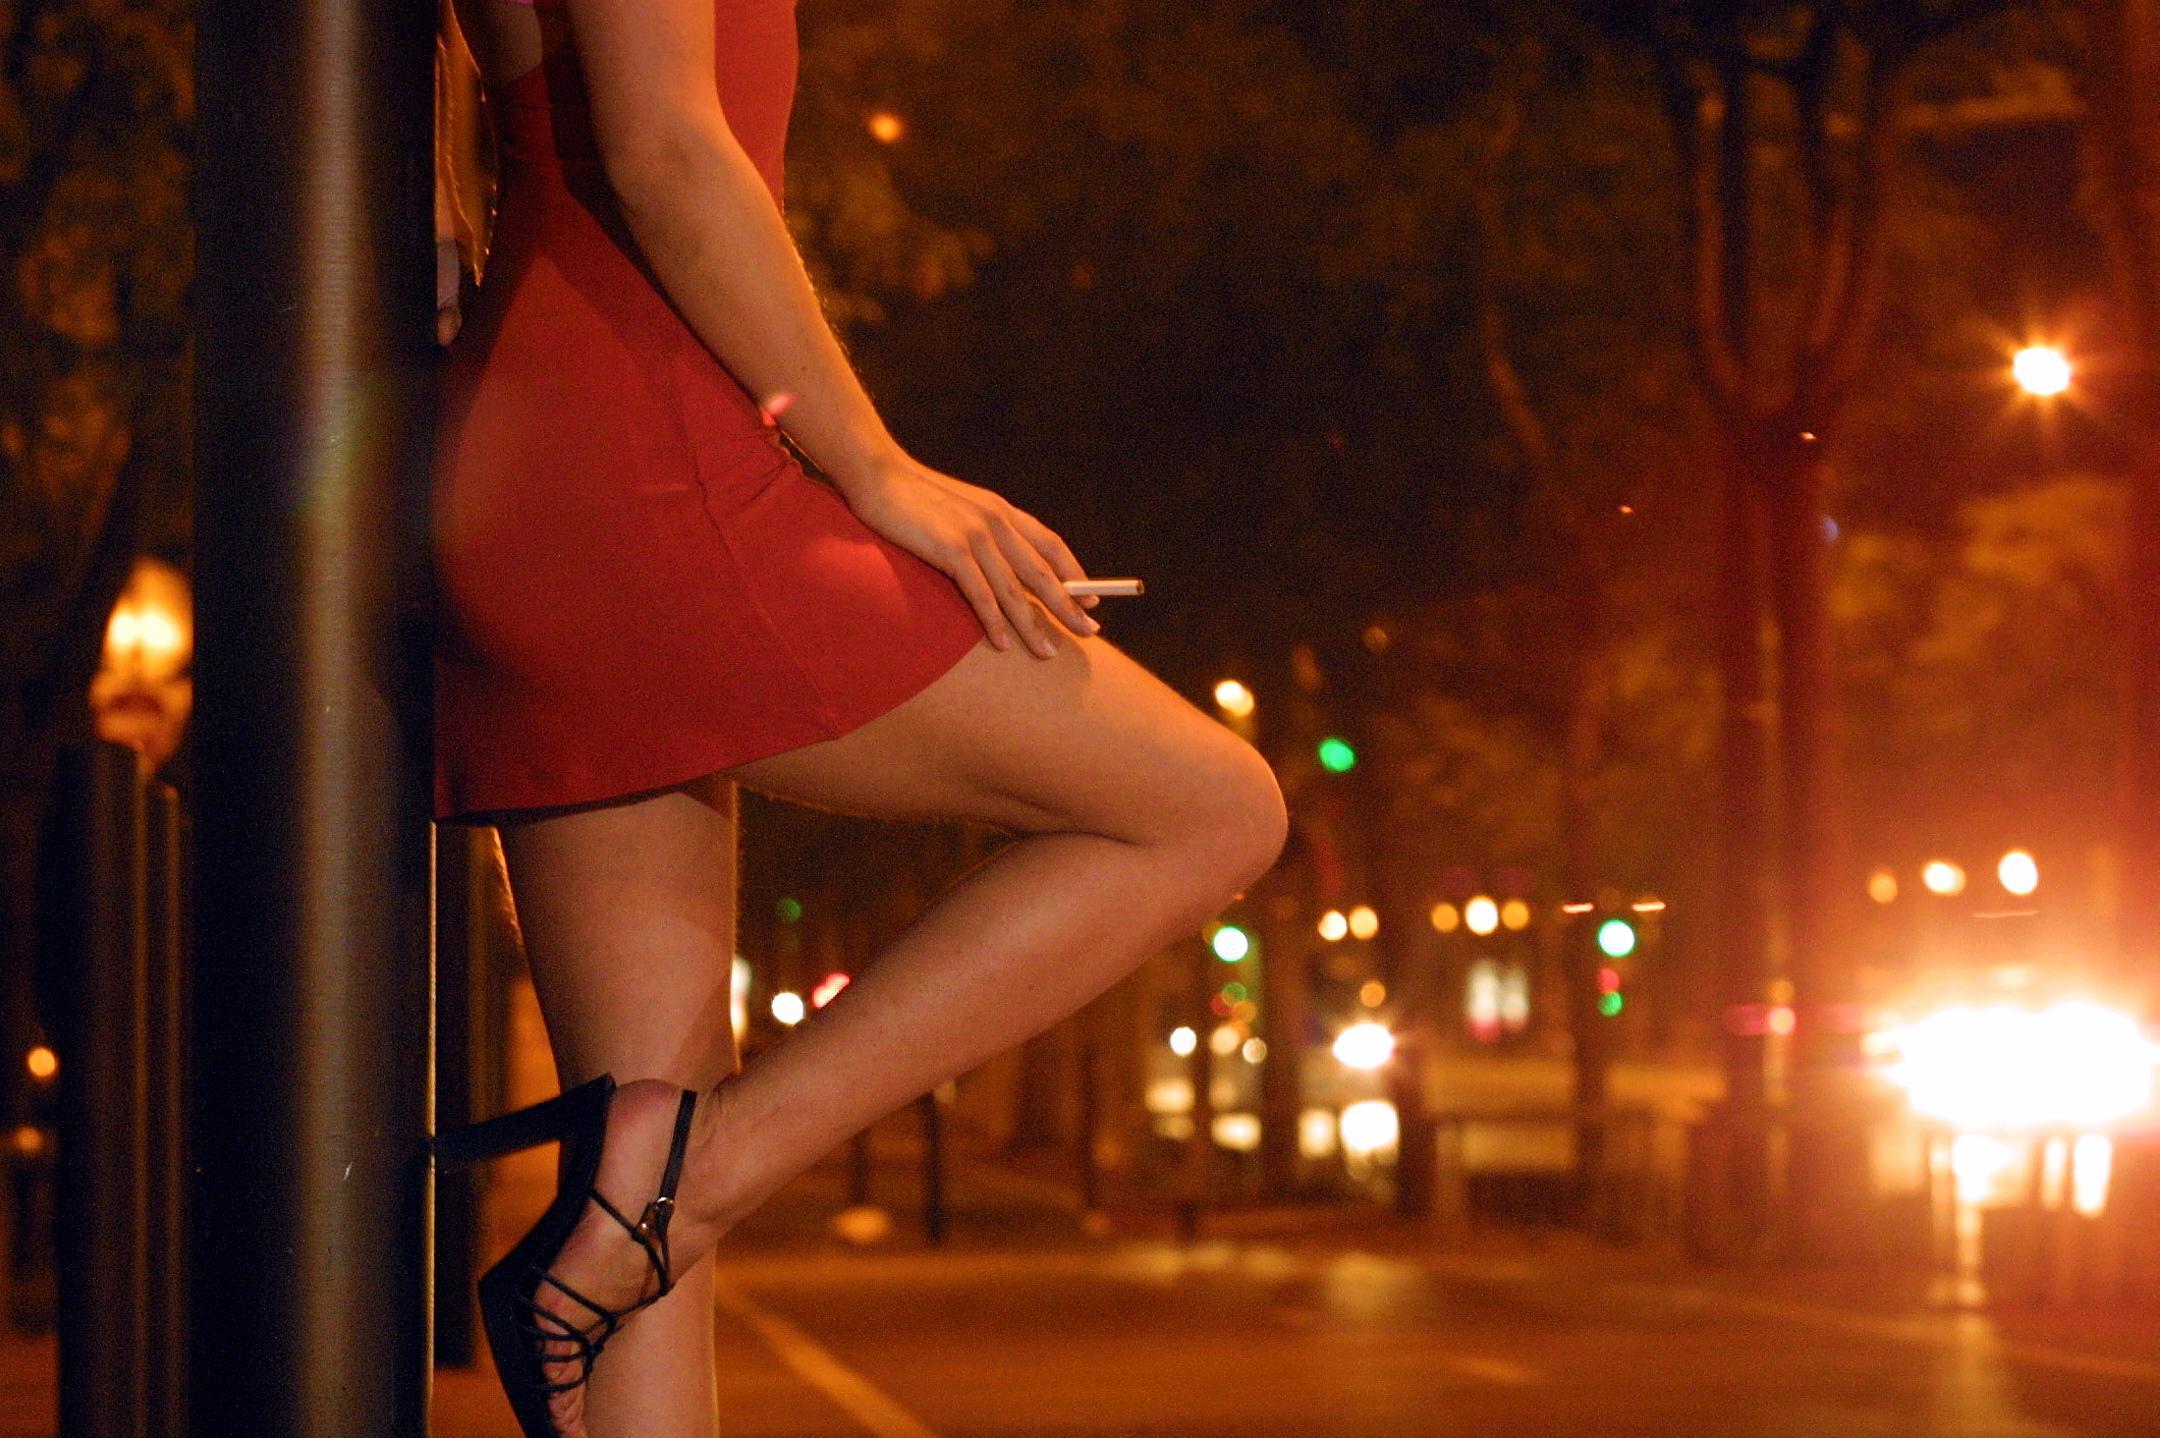 Armpit fetish online prostitution woman